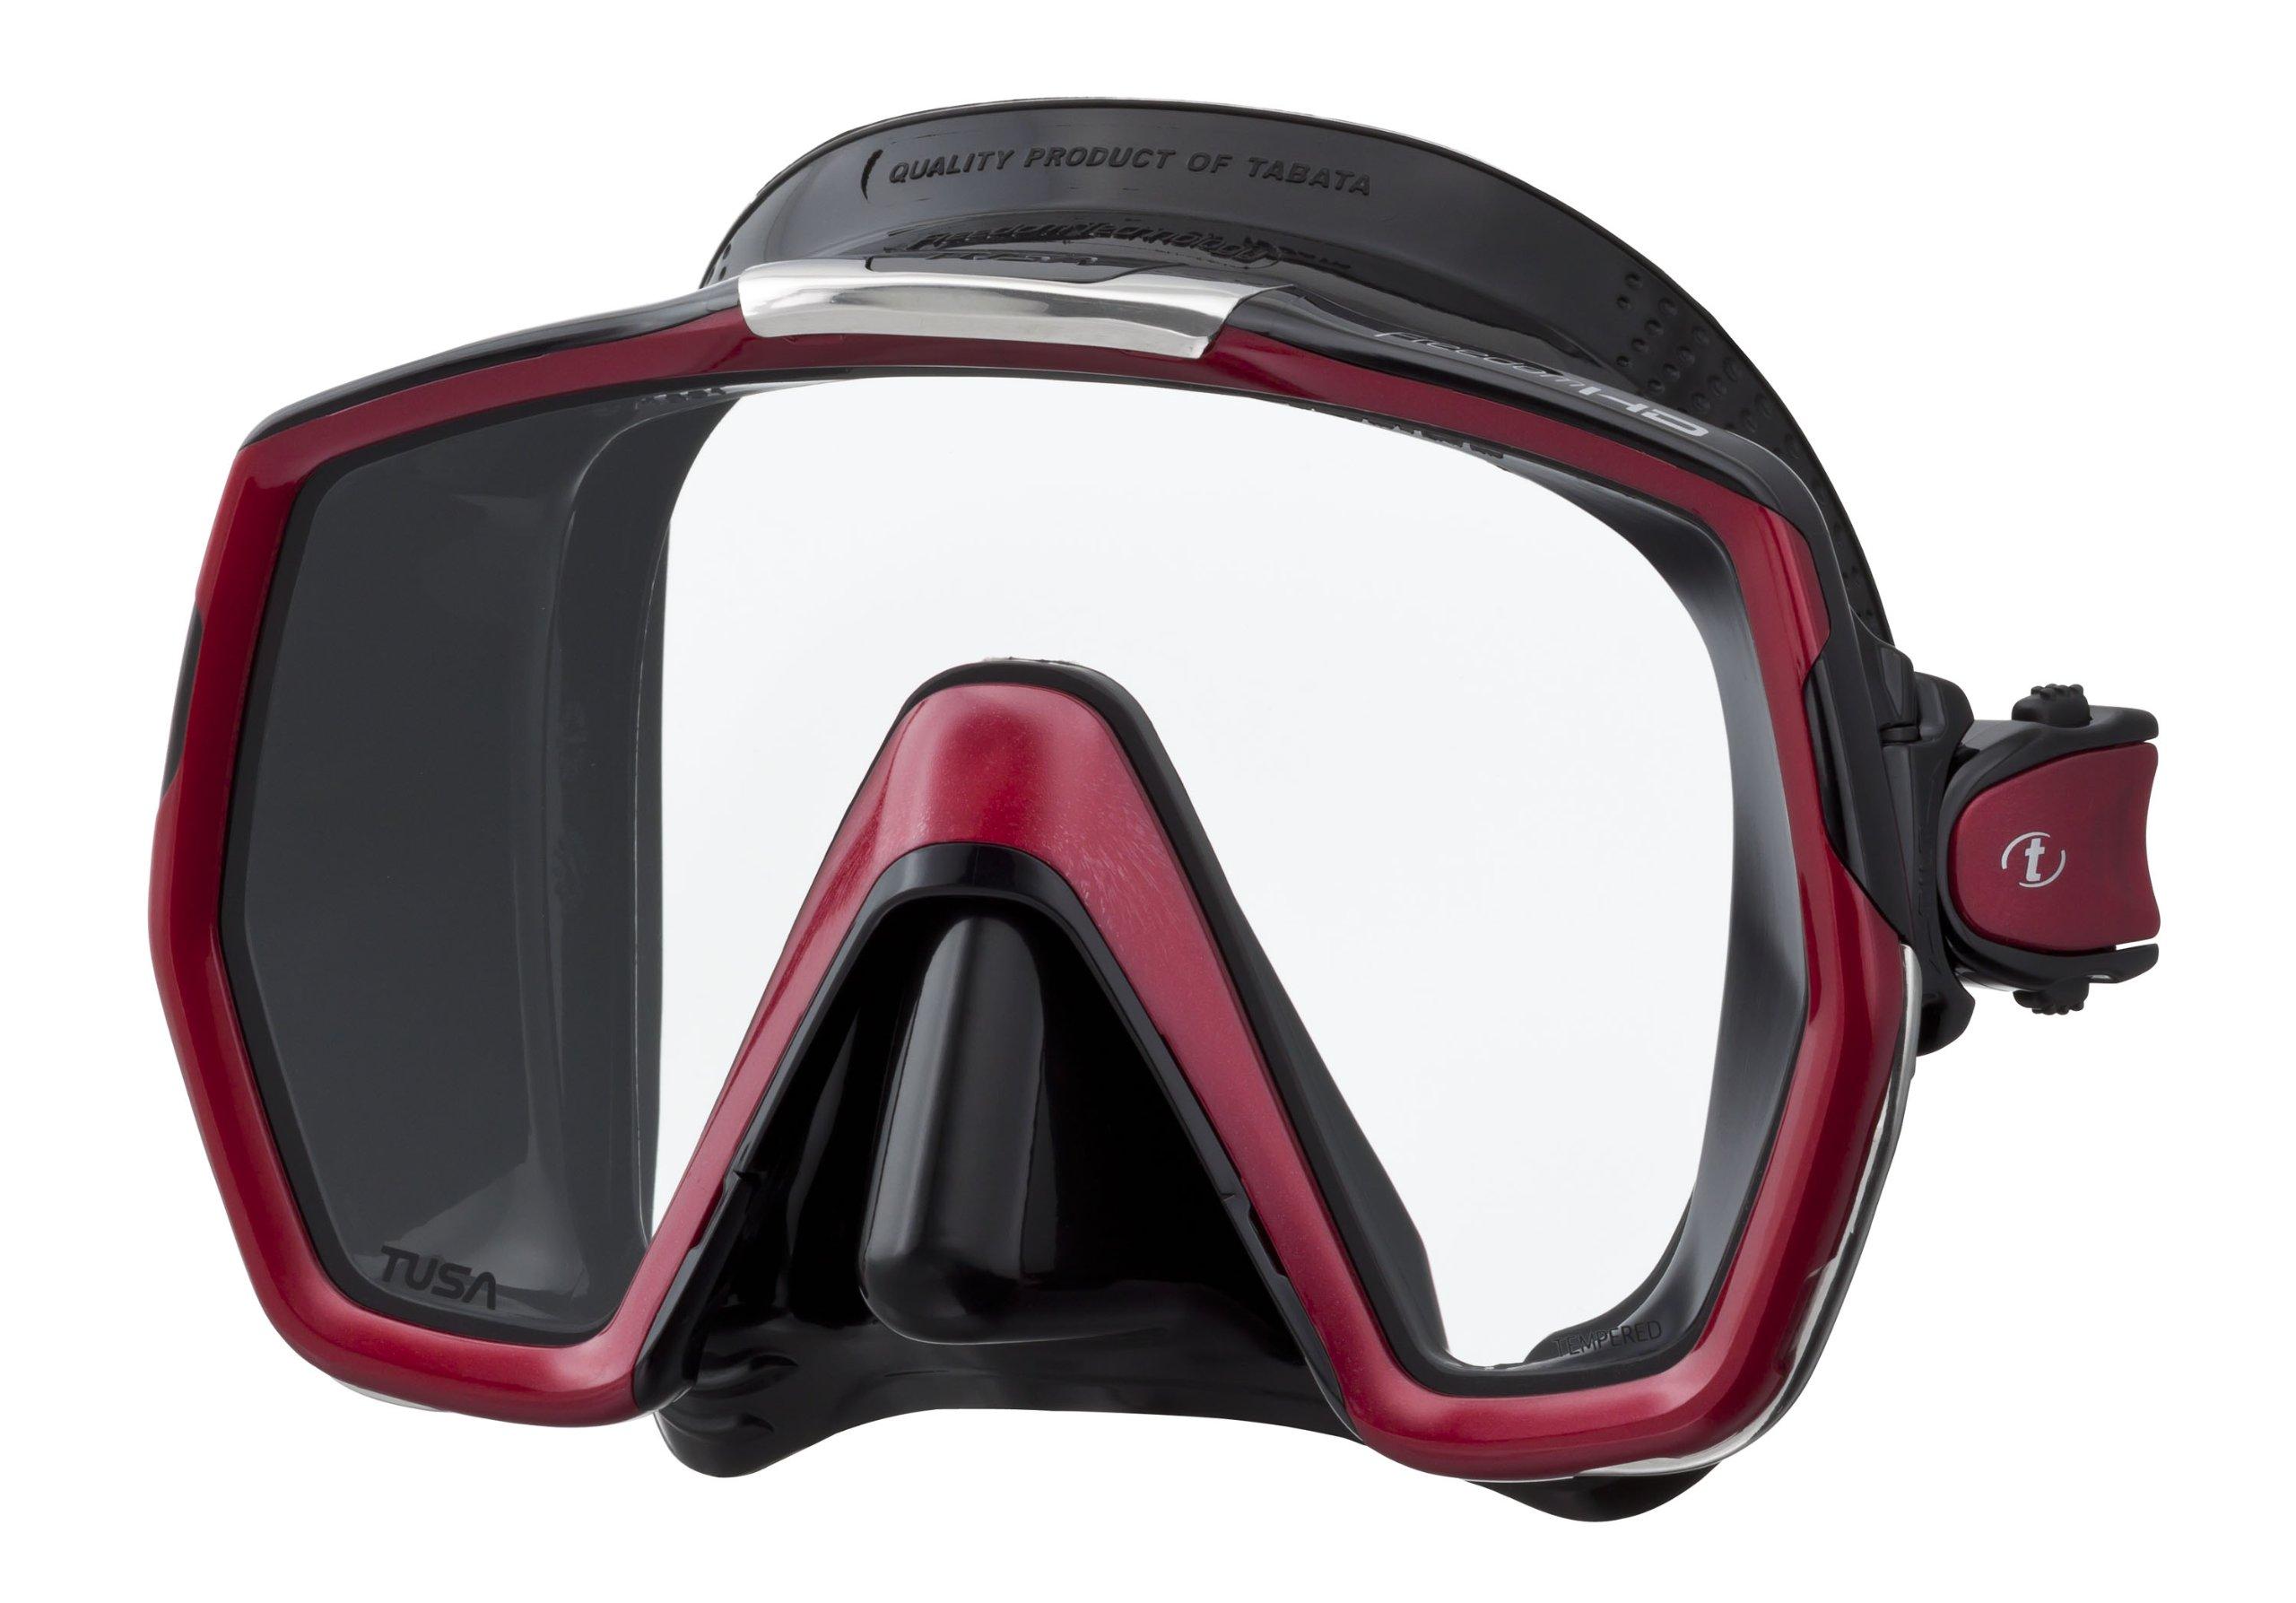 TUSA M-1001 Freedom HD Scuba Diving Mask, Black/Metallic Dark Red